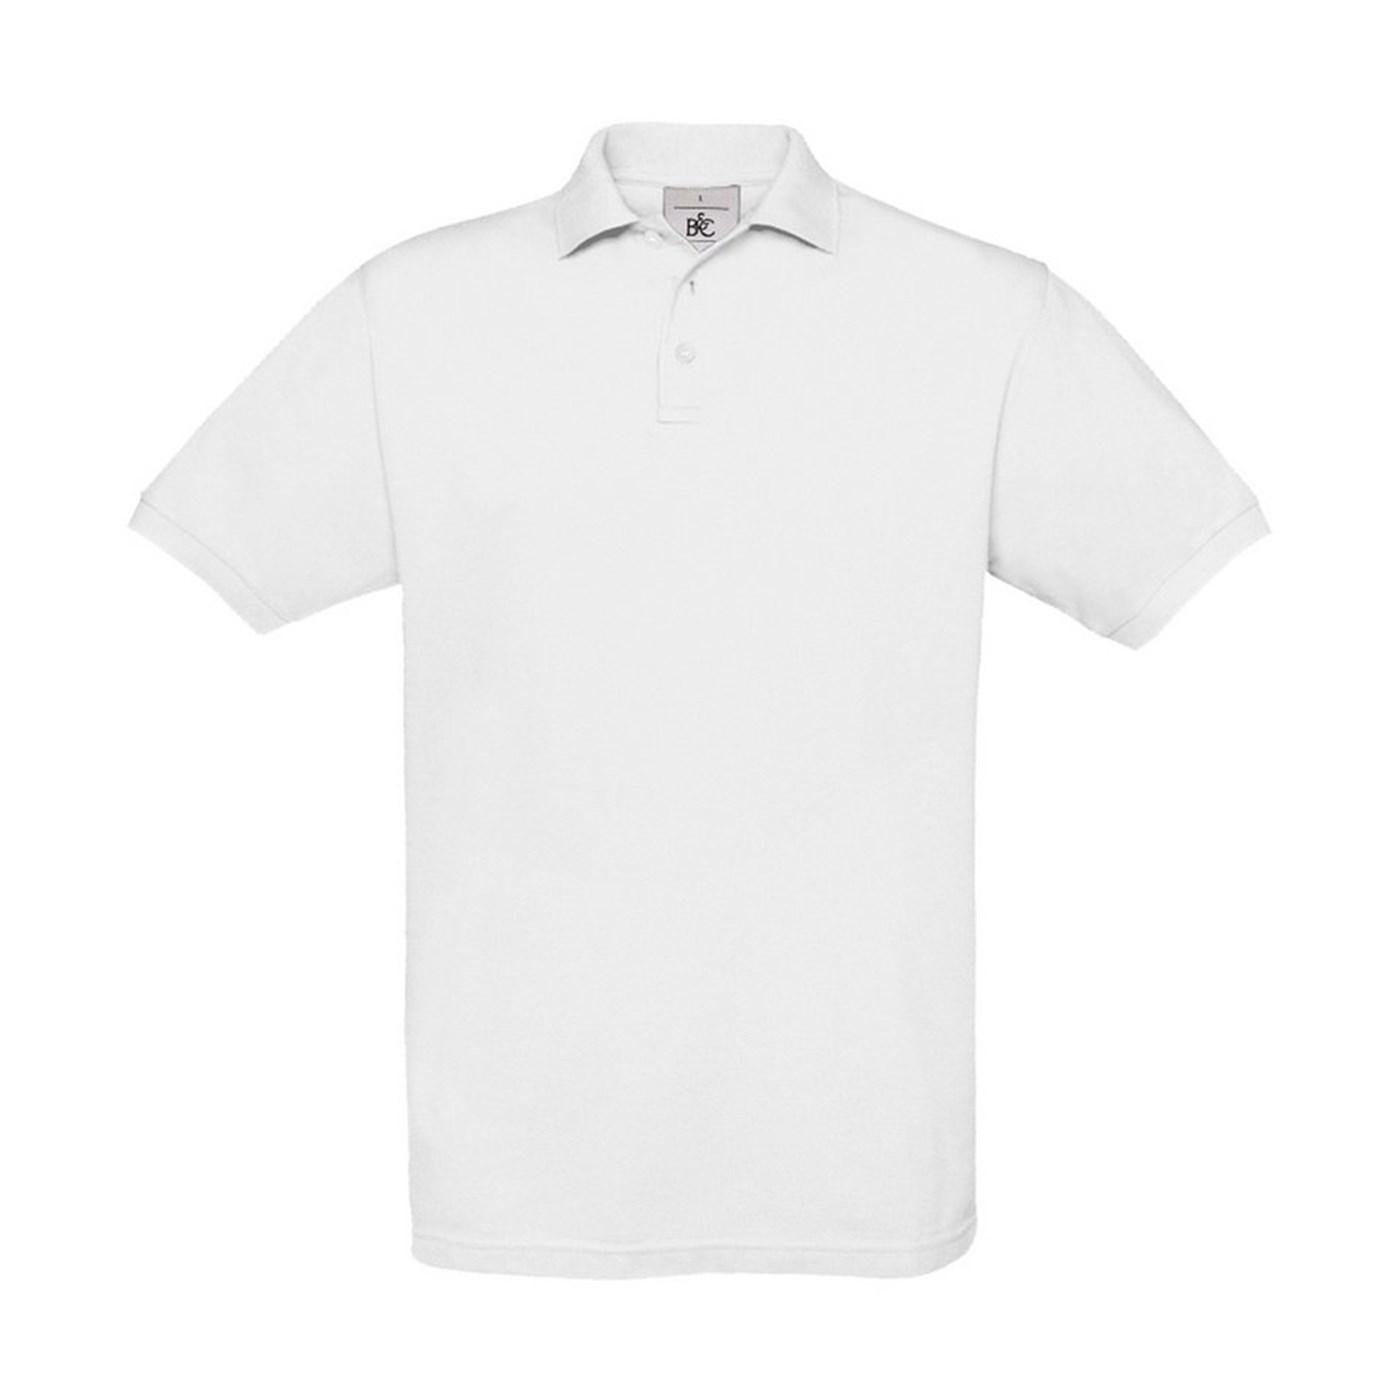 B/&C Safran Polo Shirt Khaki XL